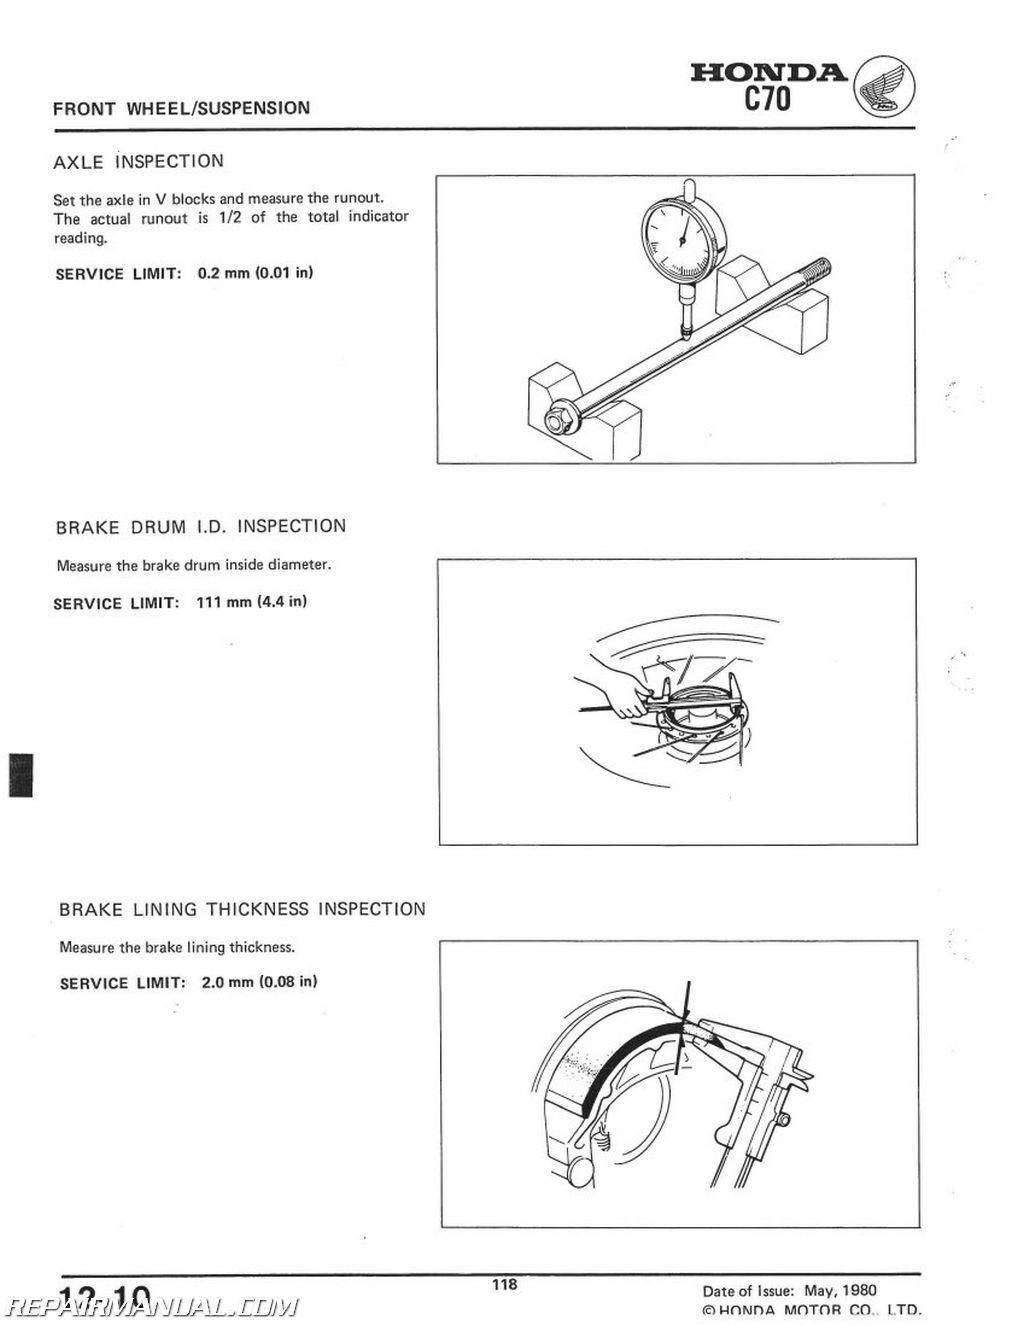 1980 honda c70 repair manual